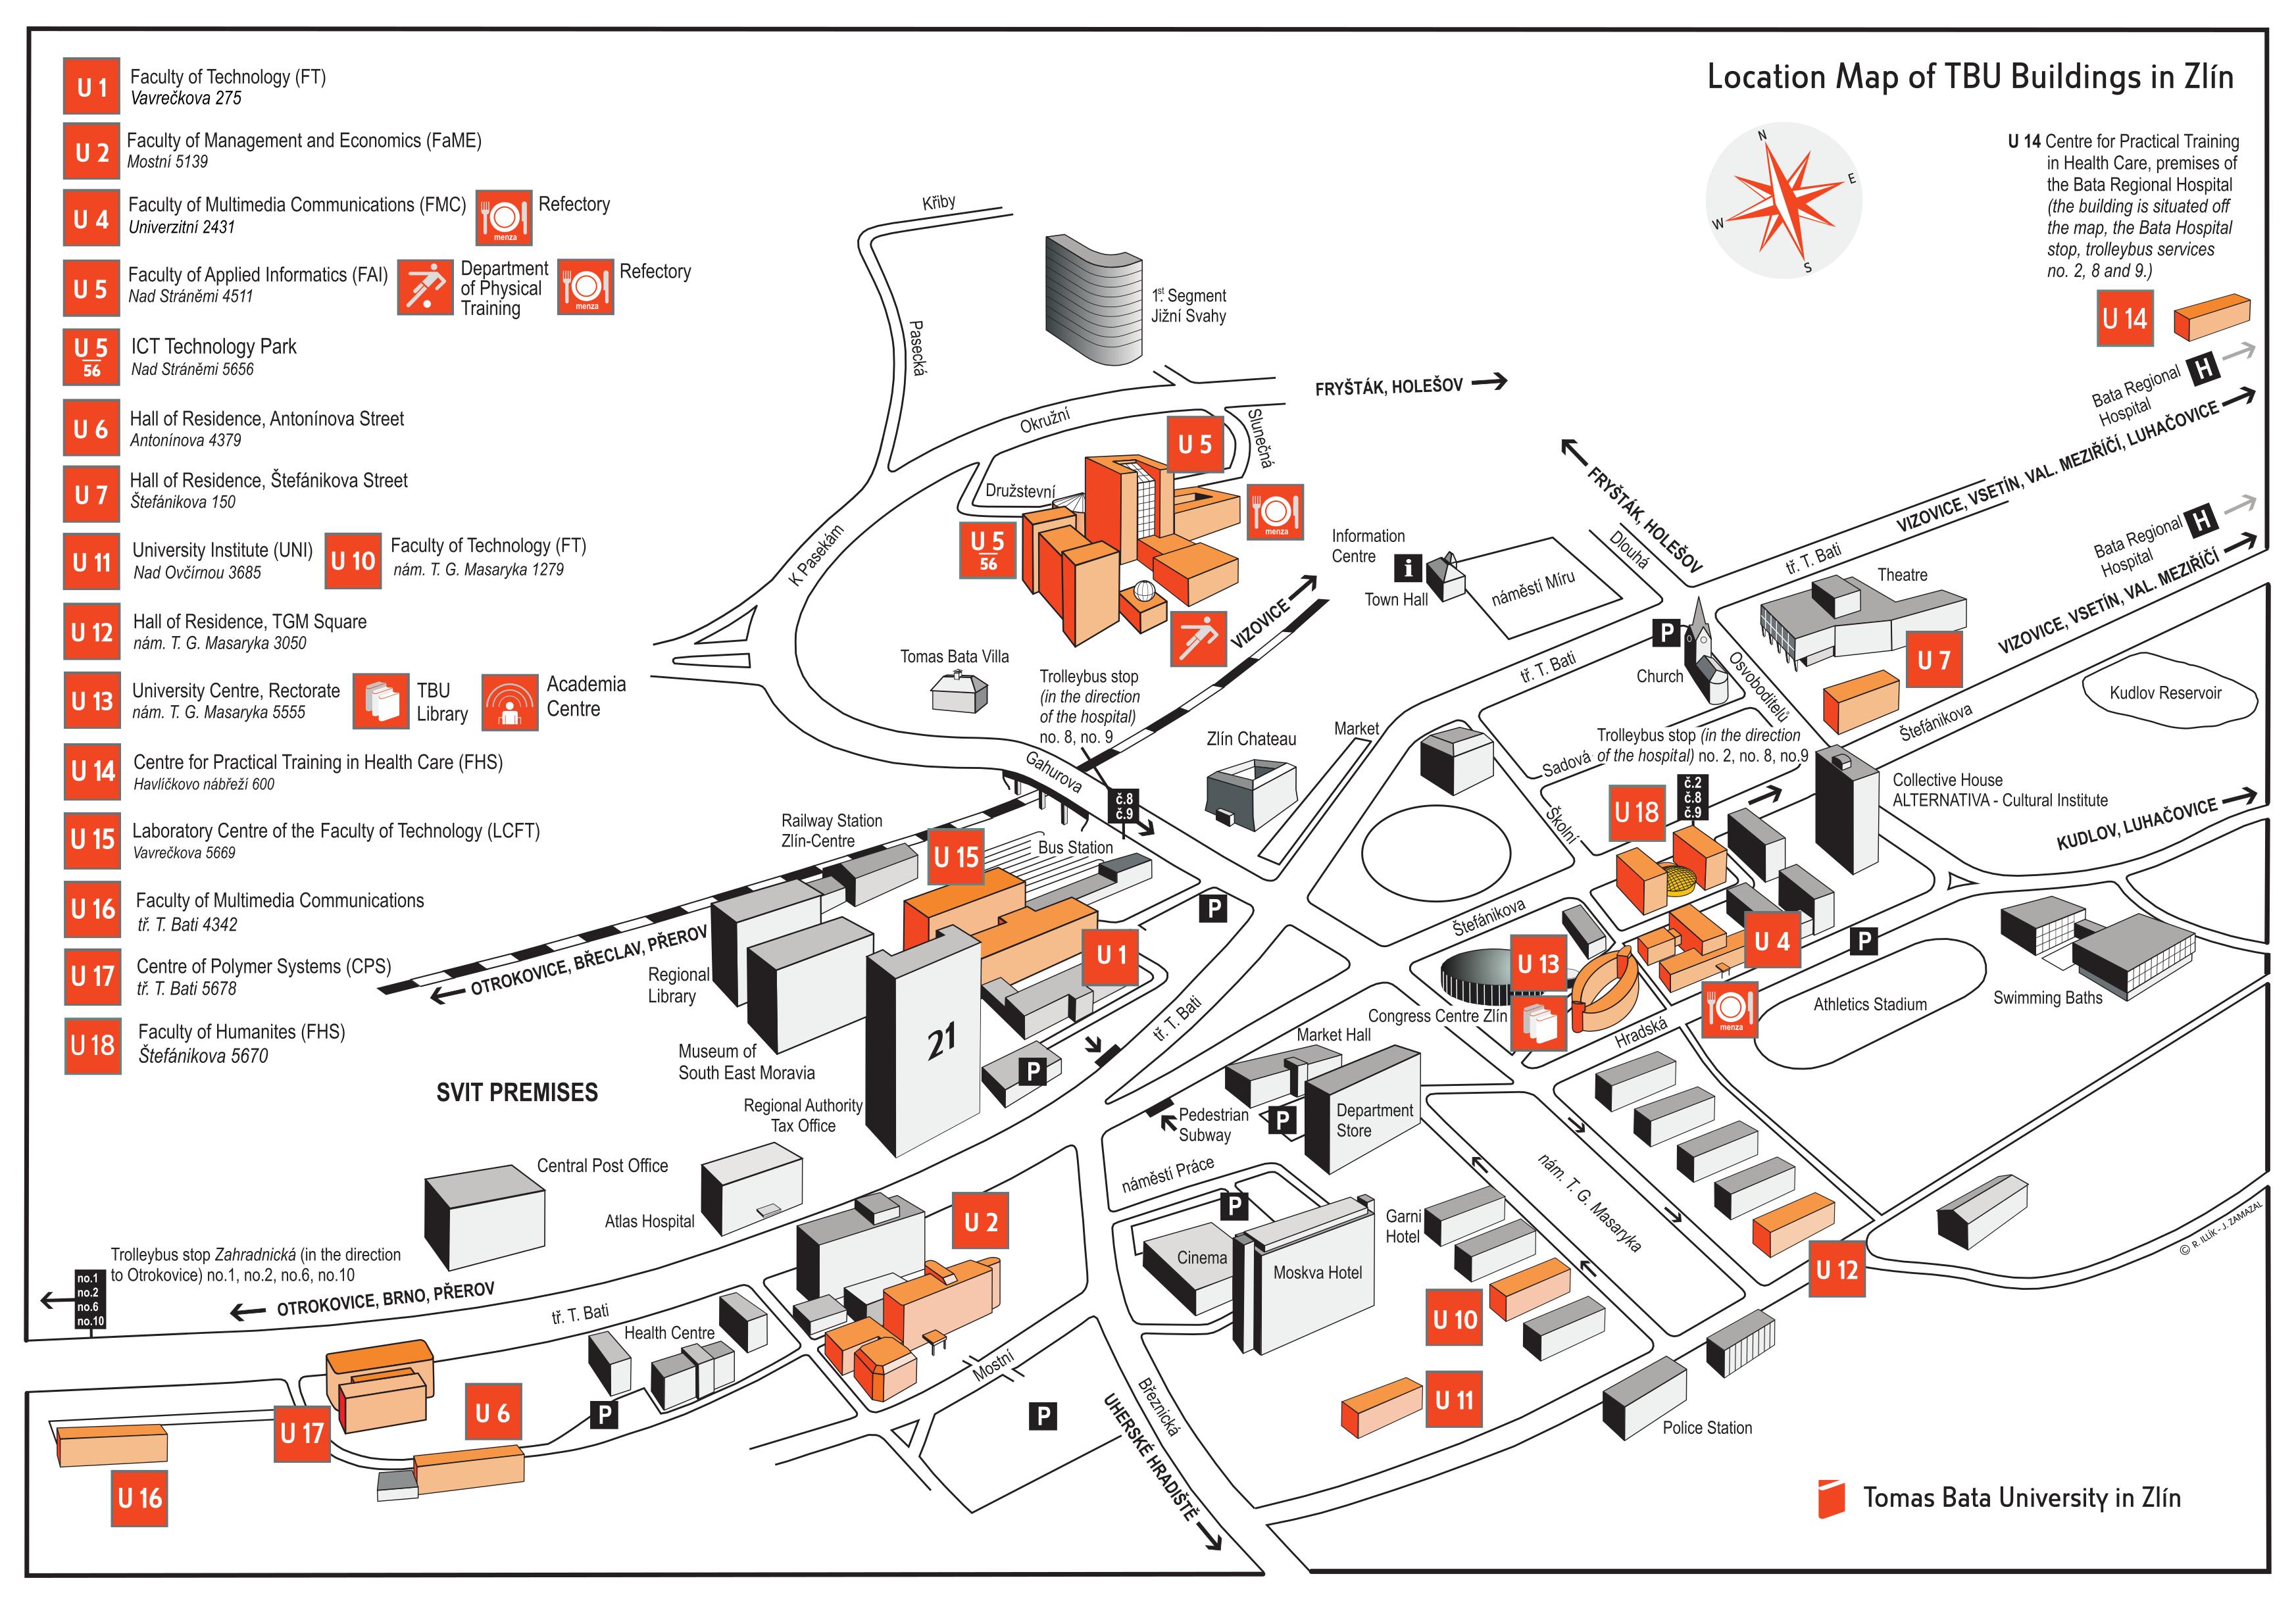 Location Map of TBU Buildings in Zlín